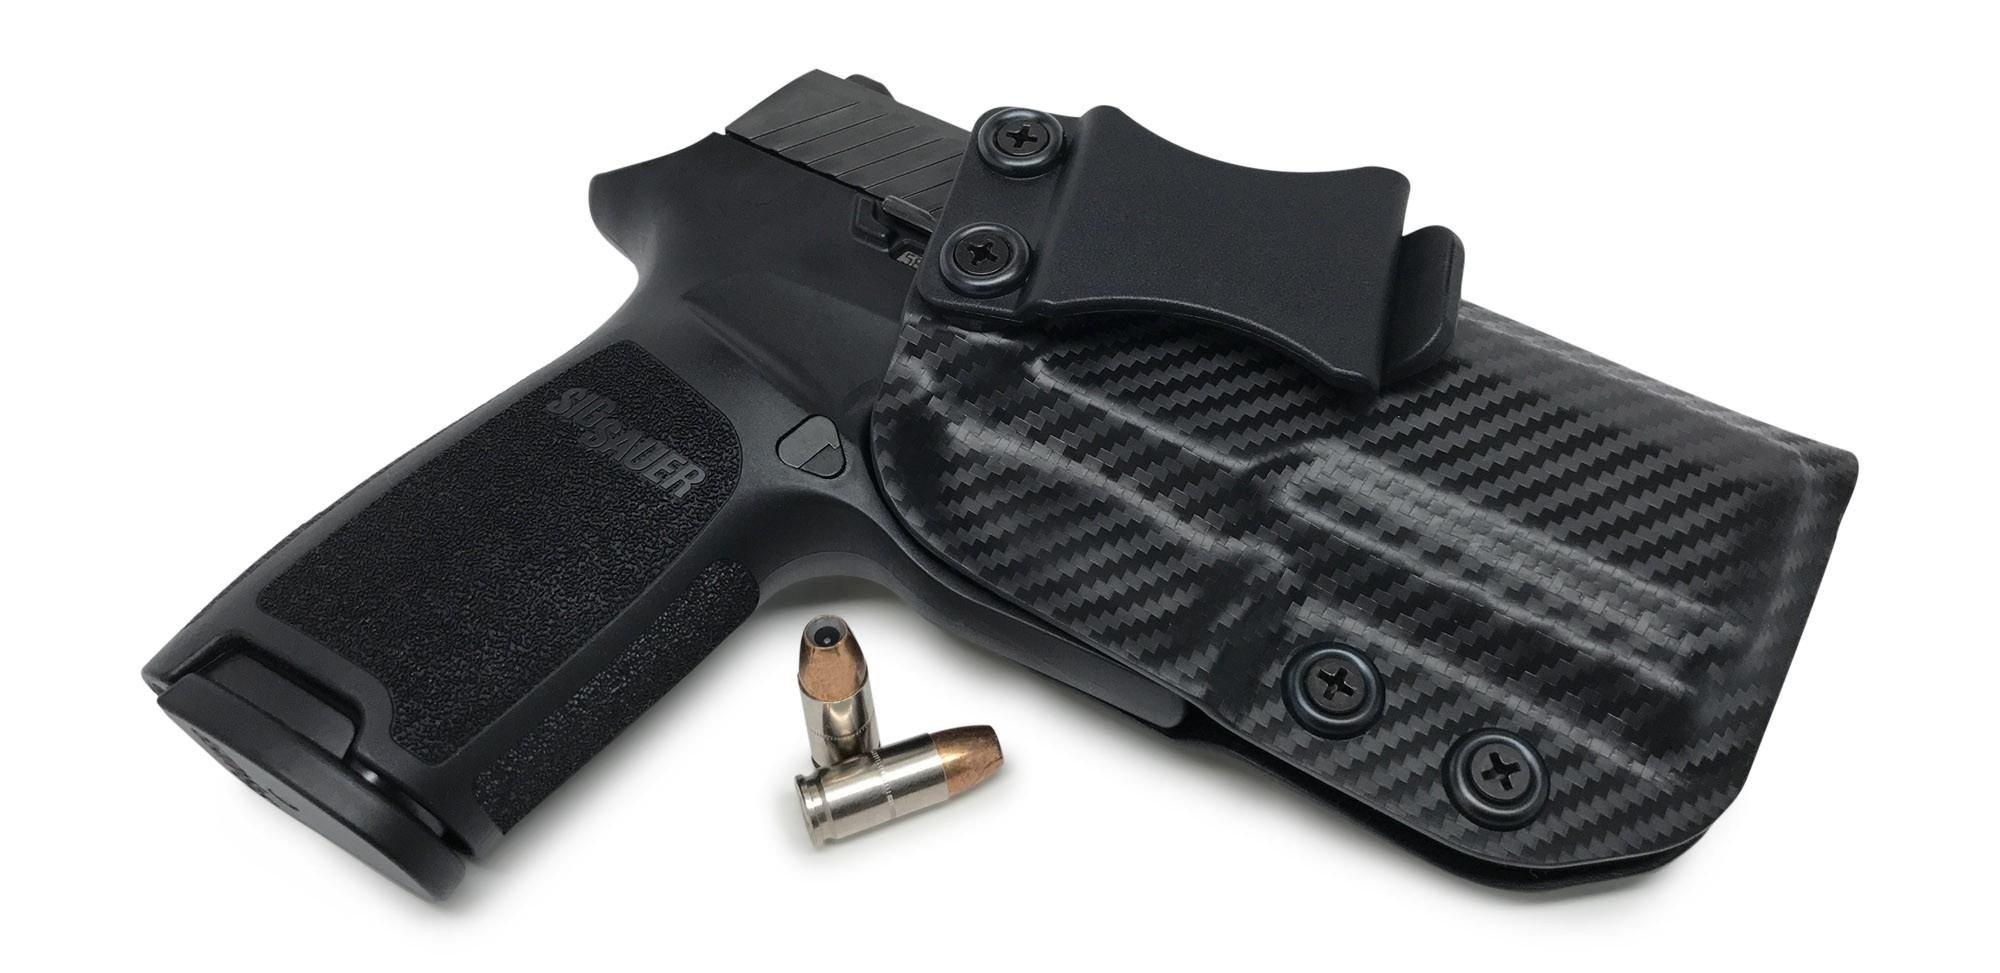 iwb-kydex-holster-sig-sauer-p320-compact-iwb-kydex-holster-1